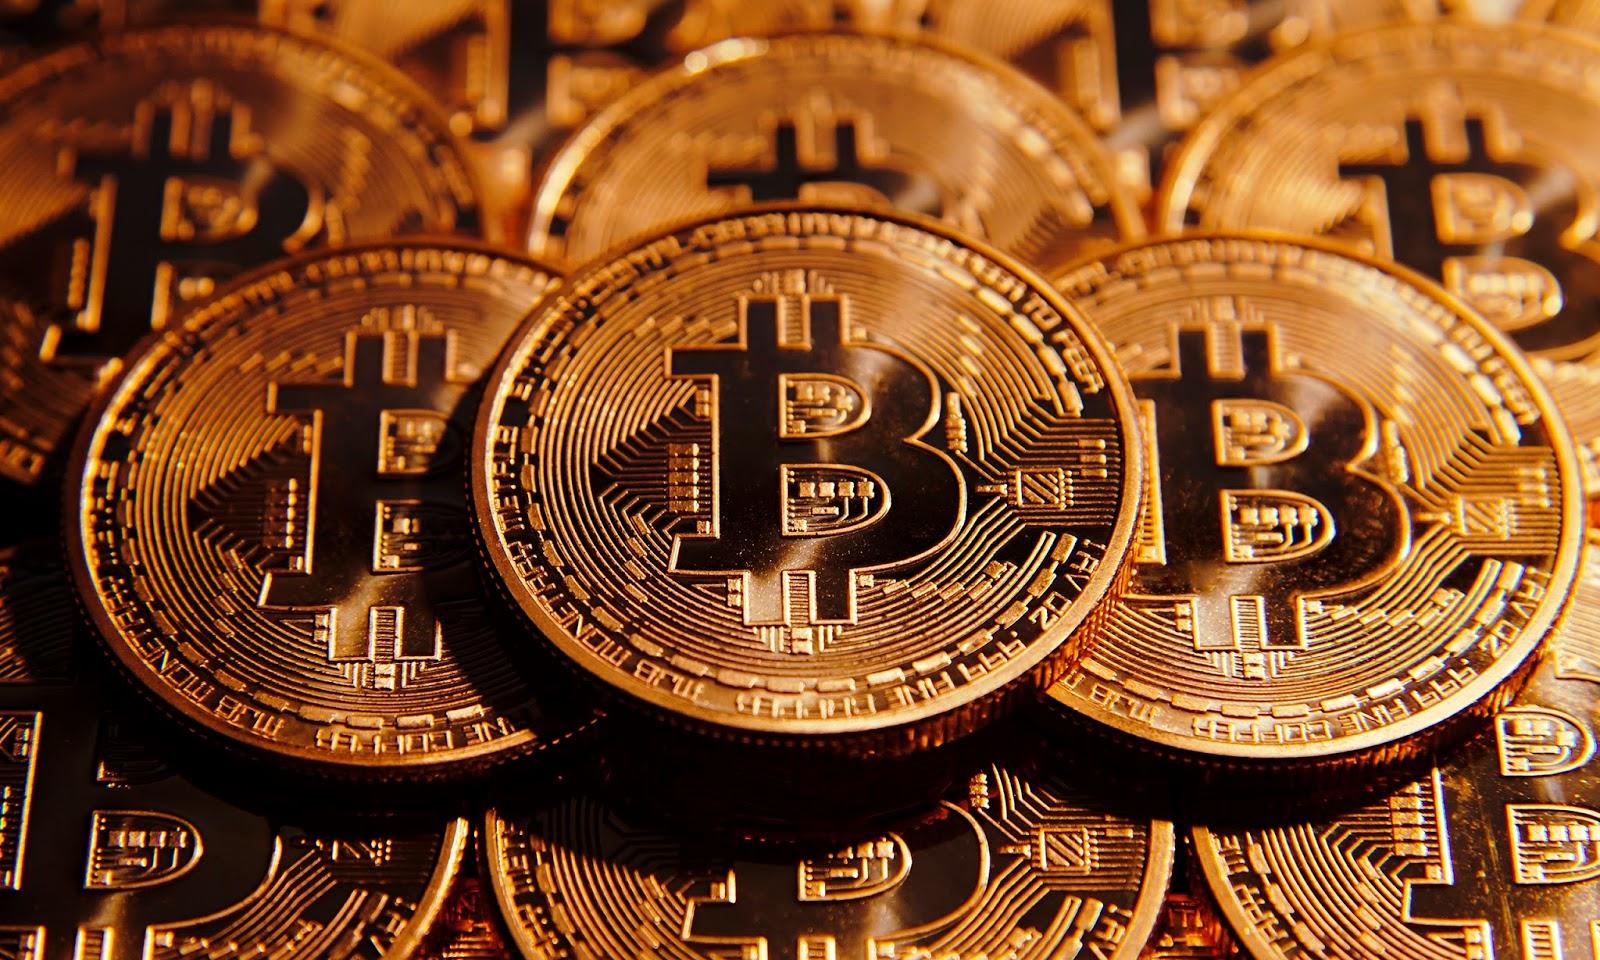 idr į btc bruce fenton bitcoin